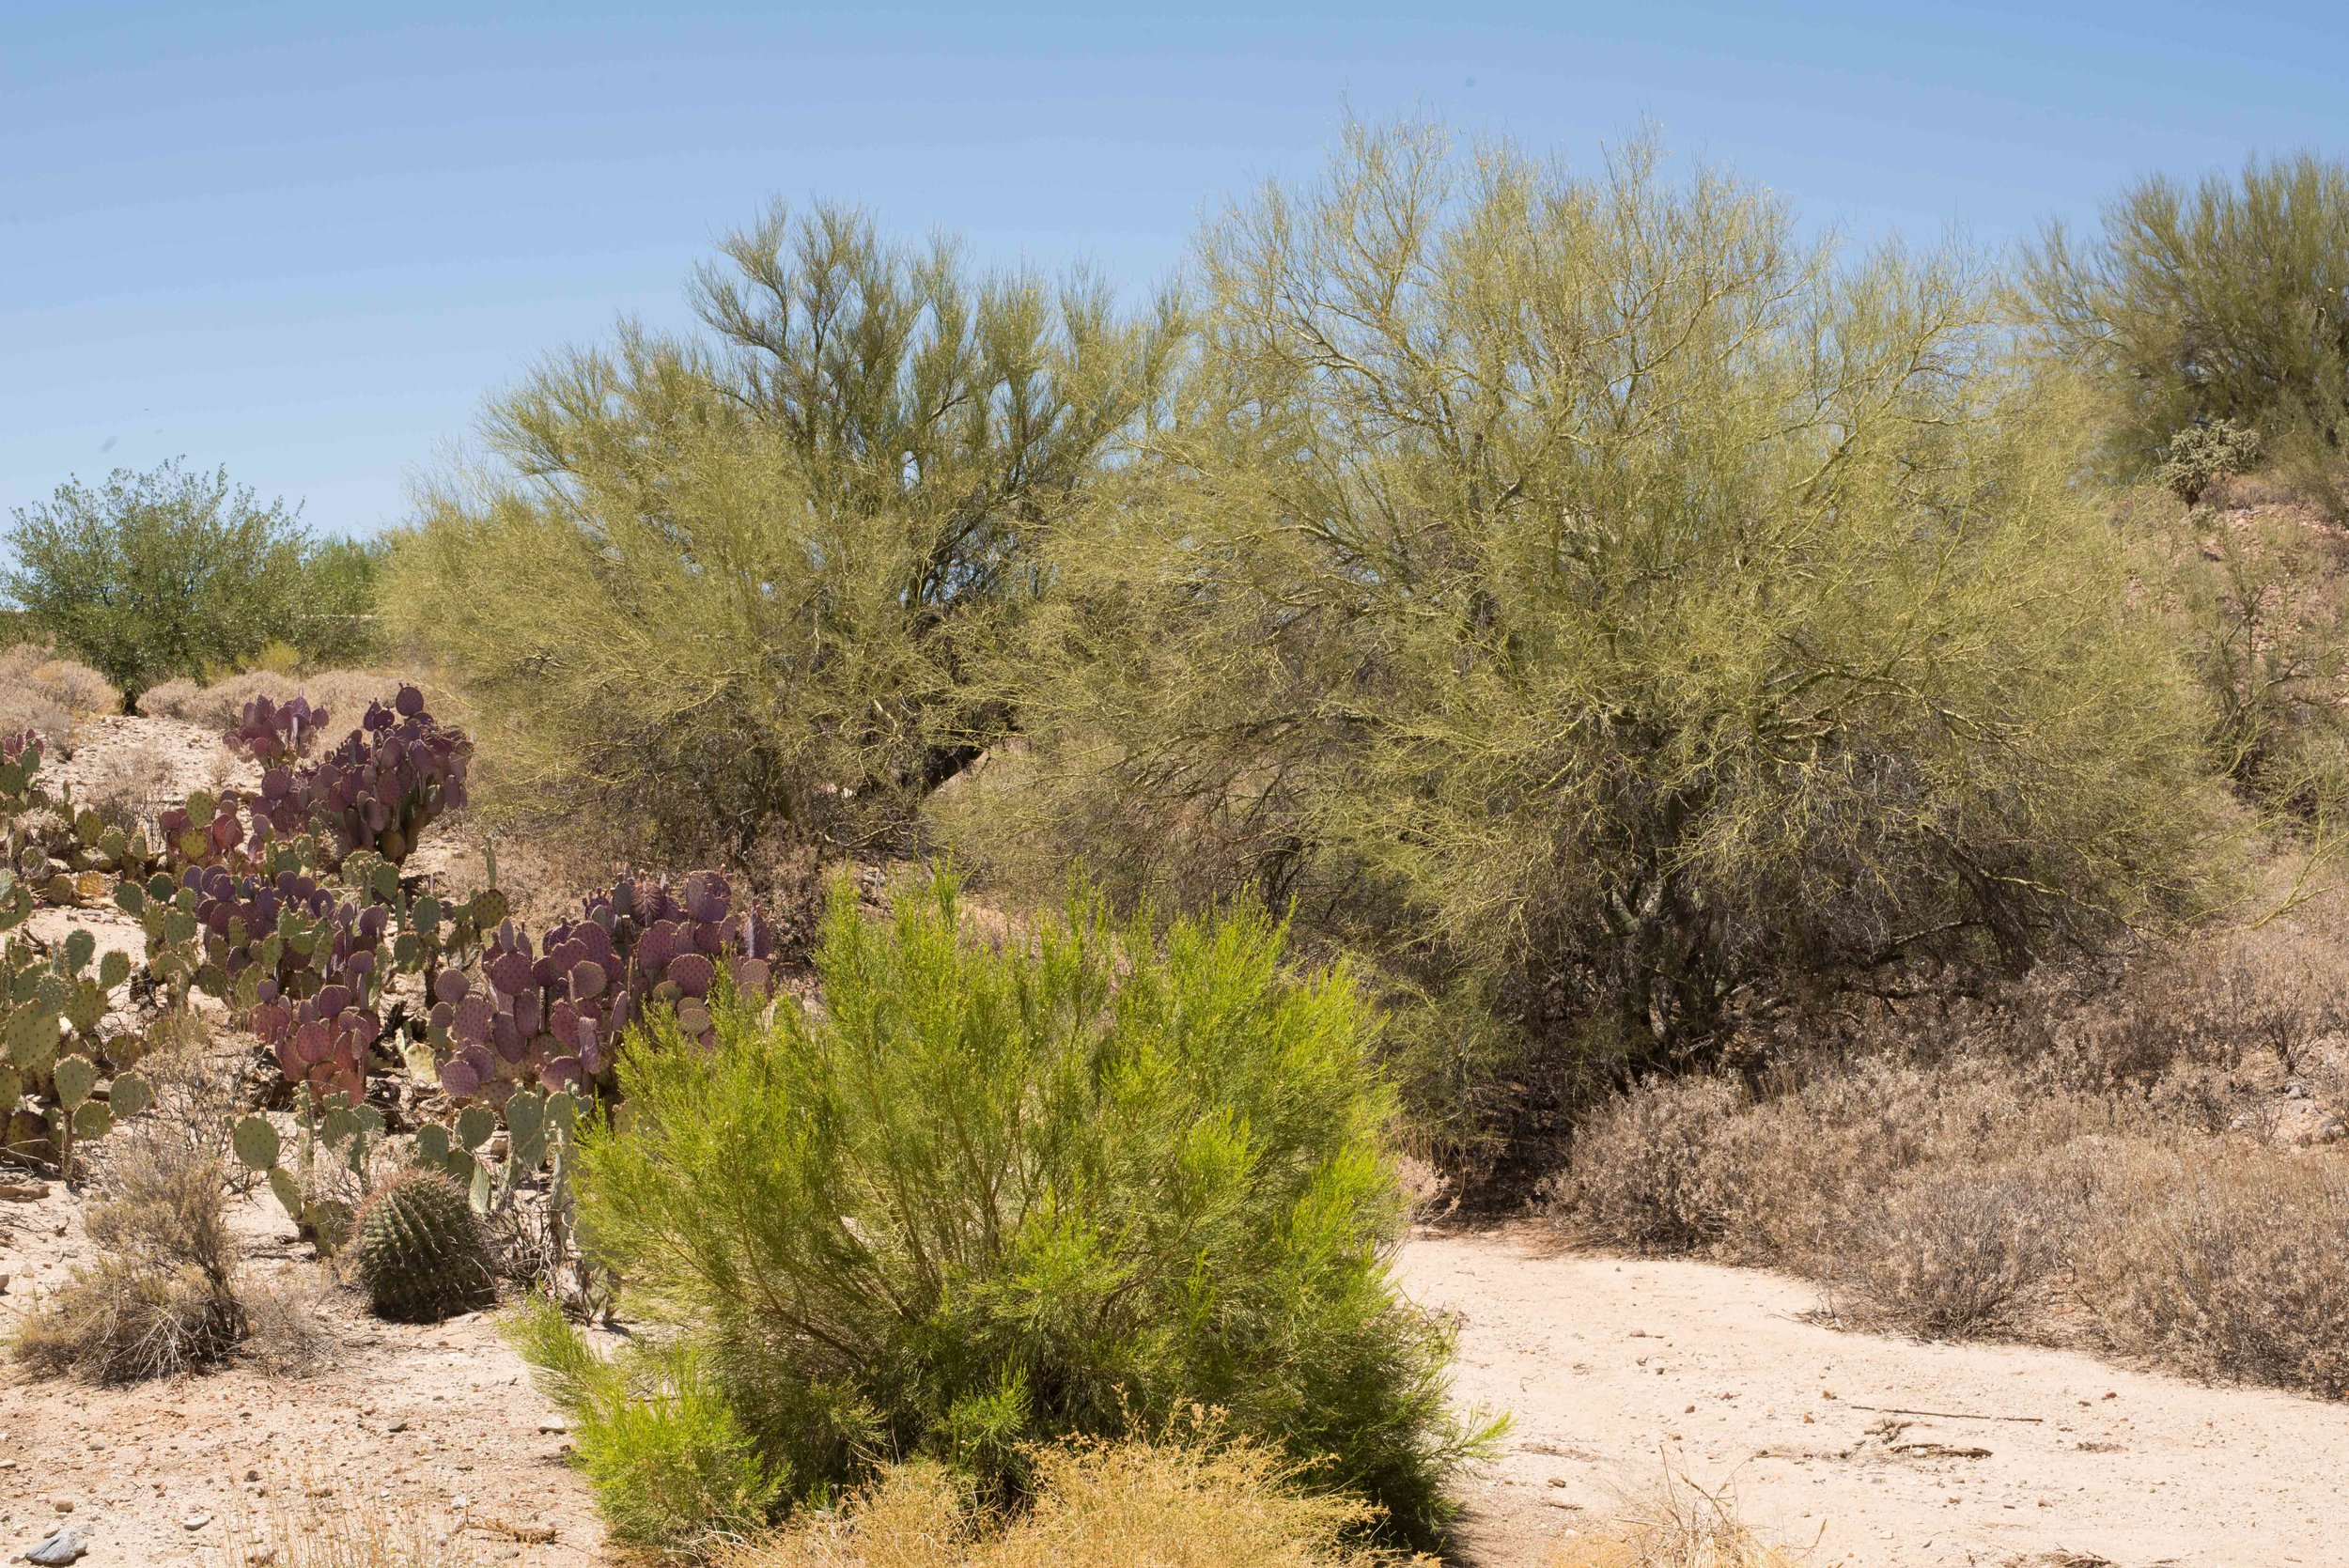 20180601-Tucson019Low Res.jpg